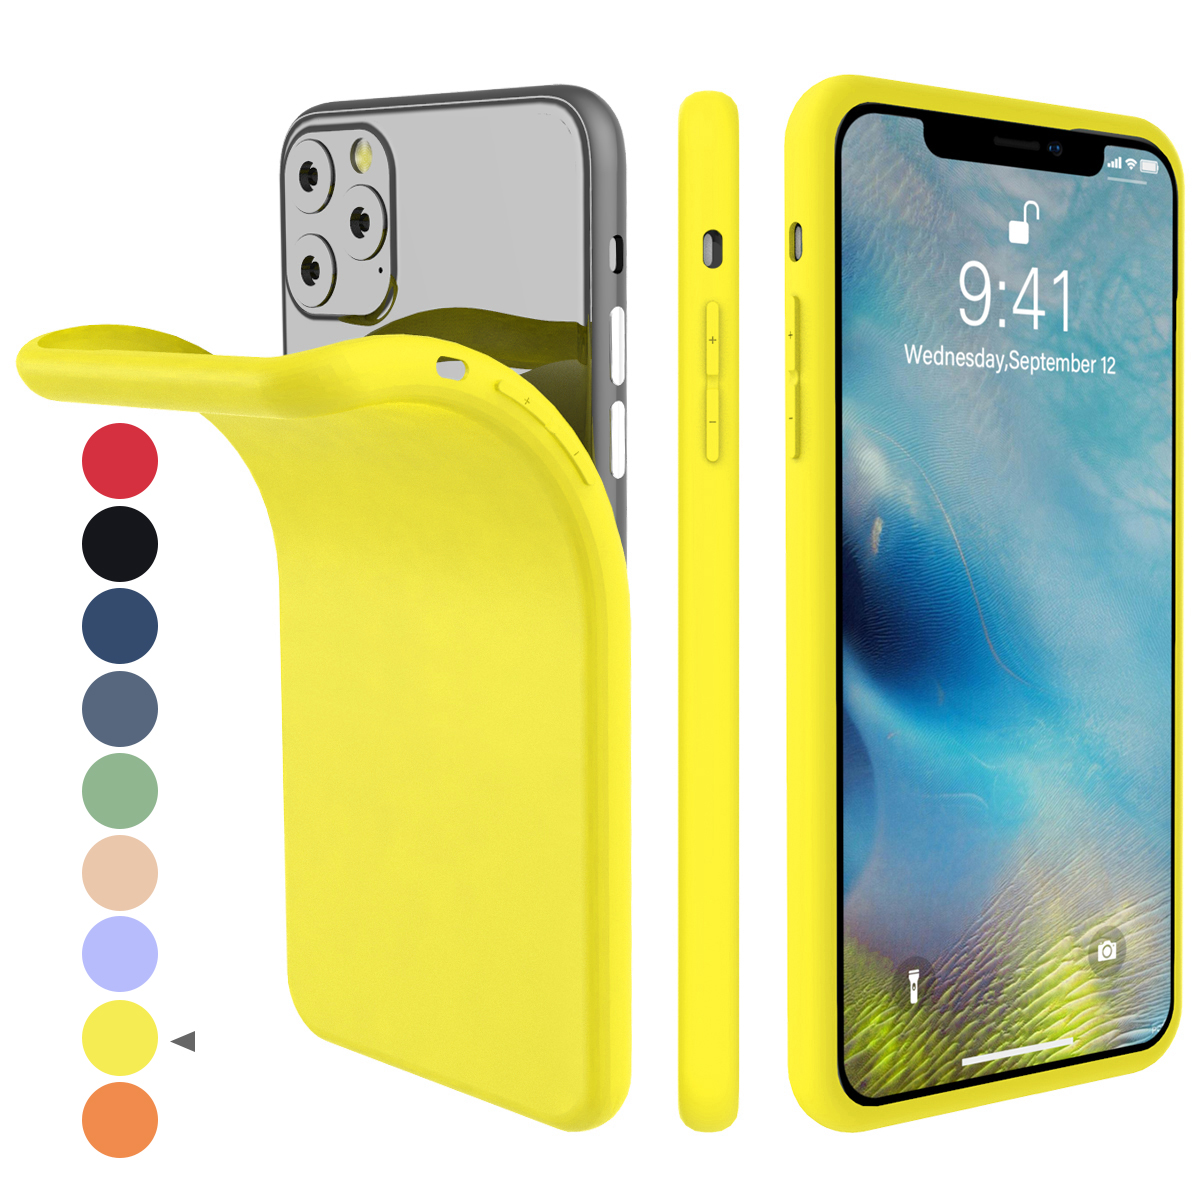 Torubia Silicone Case for iPhone 11/11 Pro/11 Pro Max 122